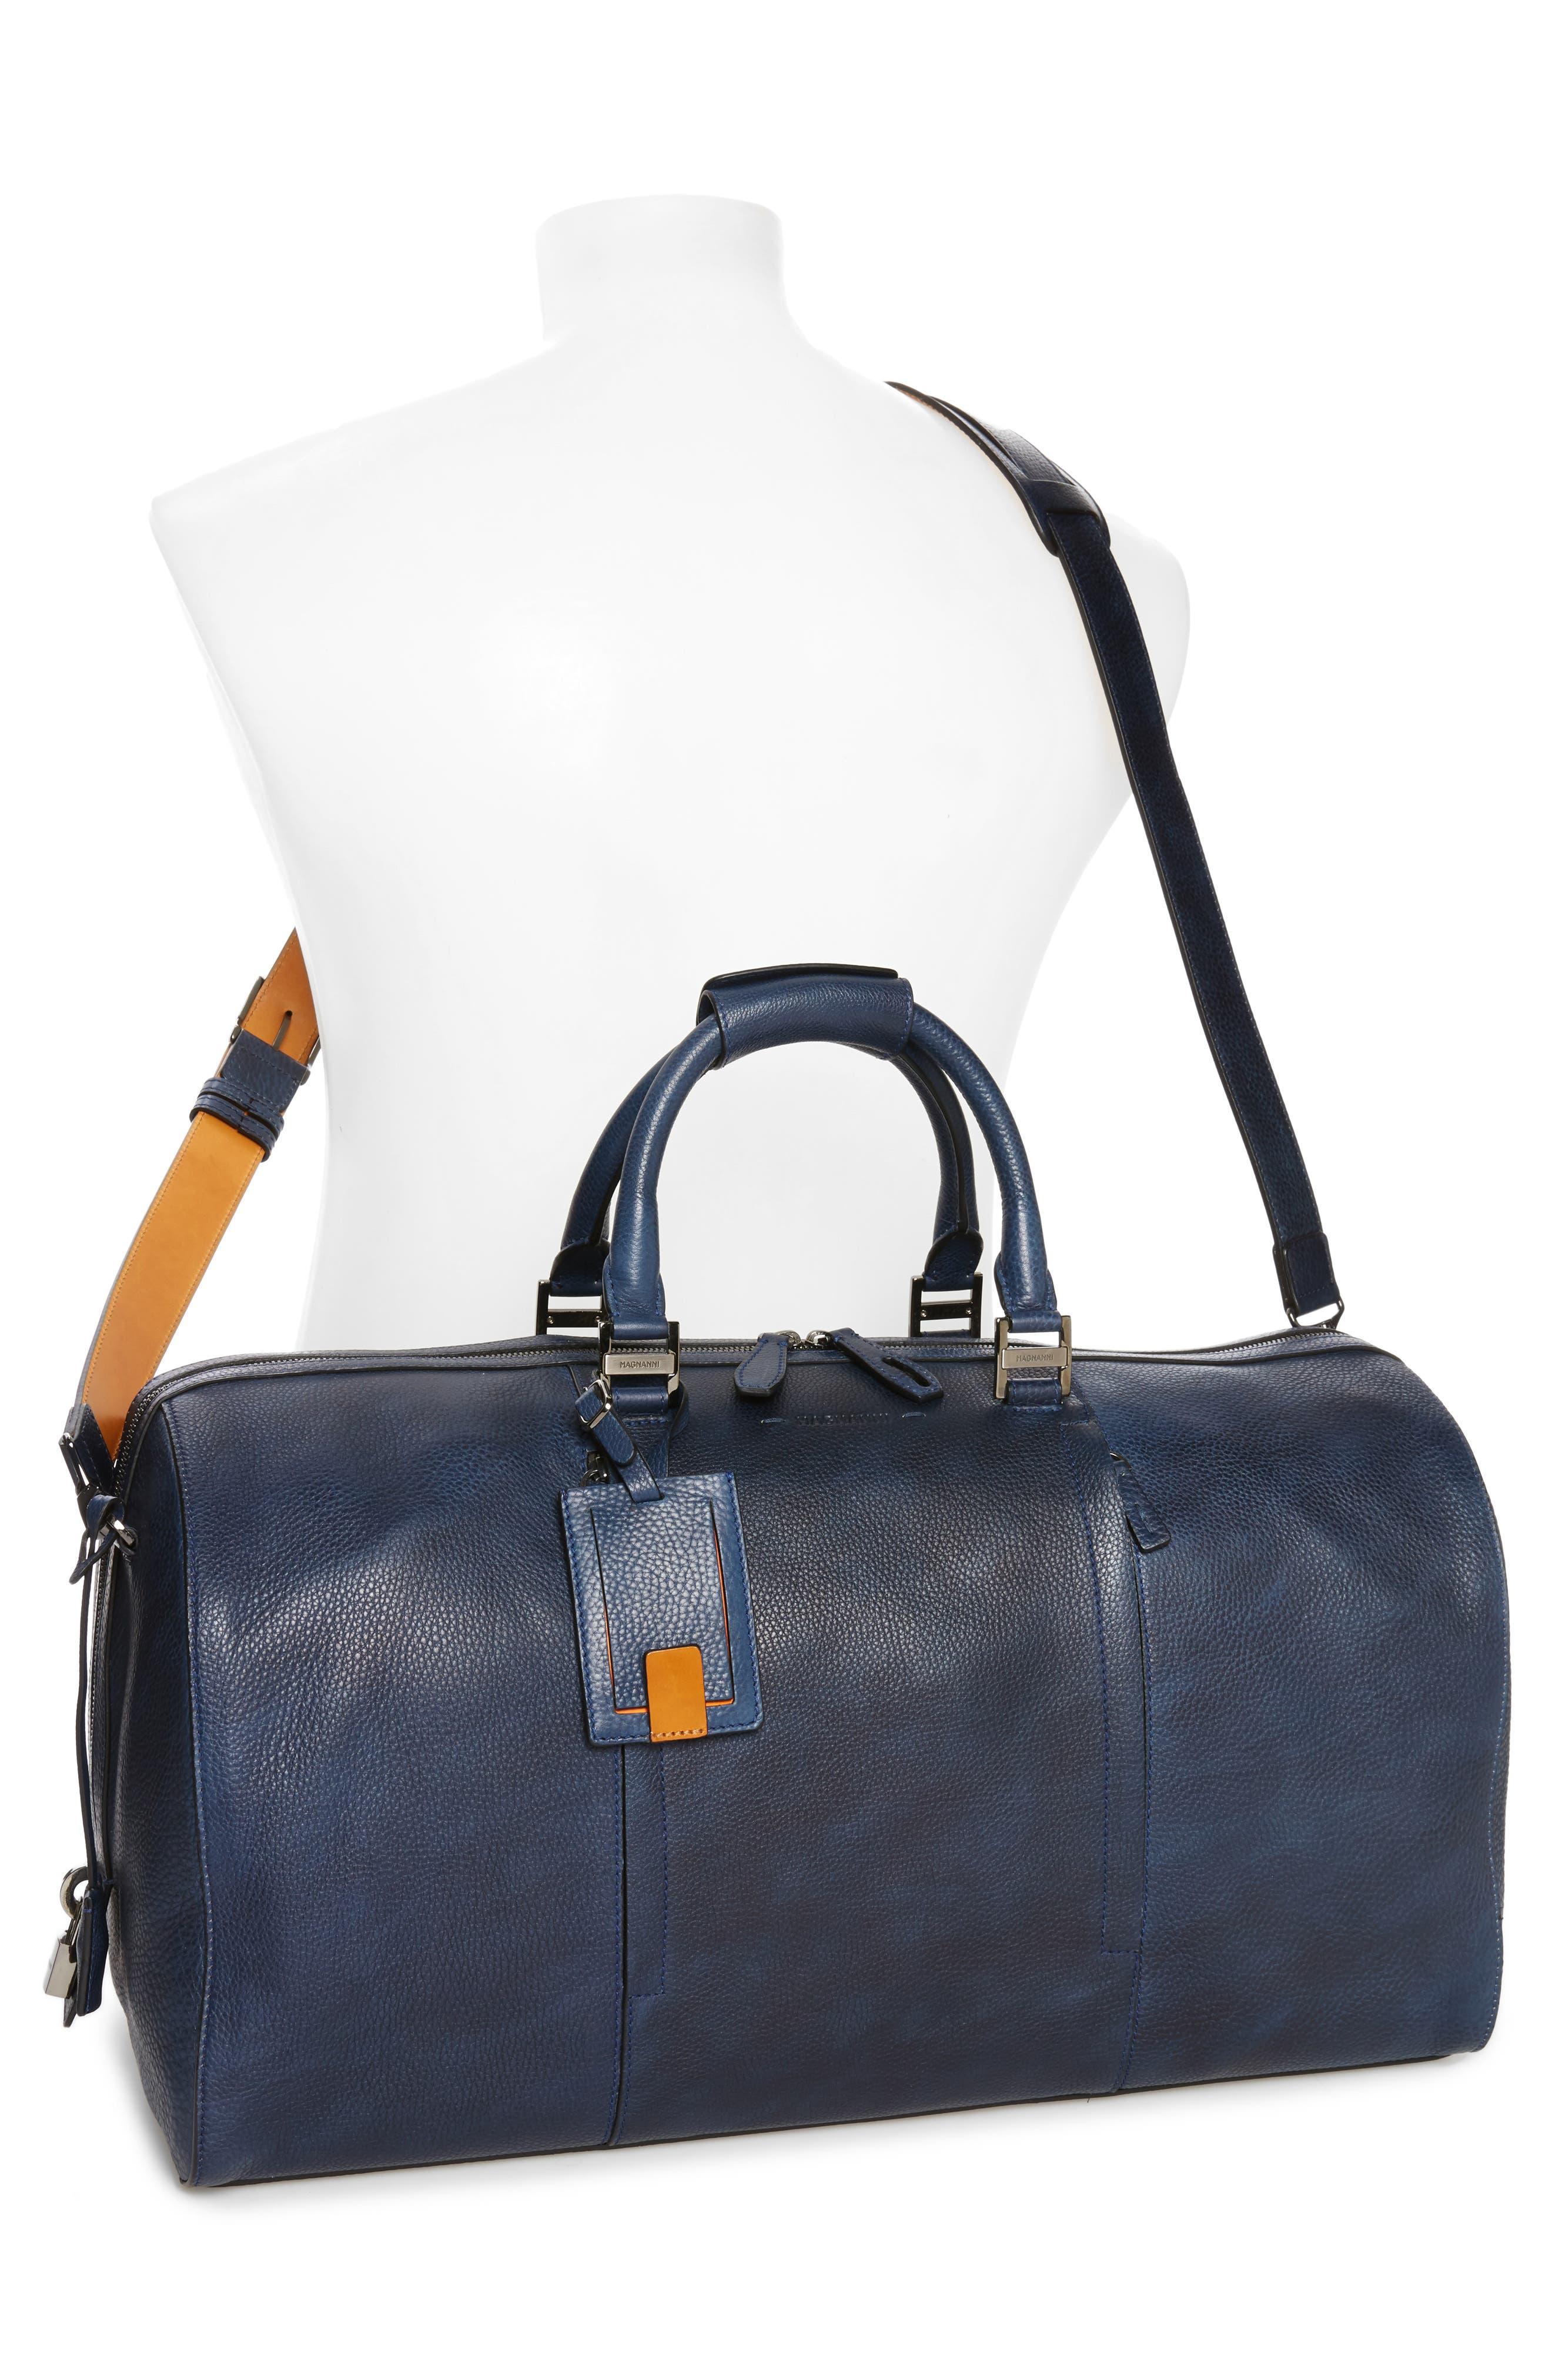 Traveler Leather Duffel Bag,                             Alternate thumbnail 8, color,